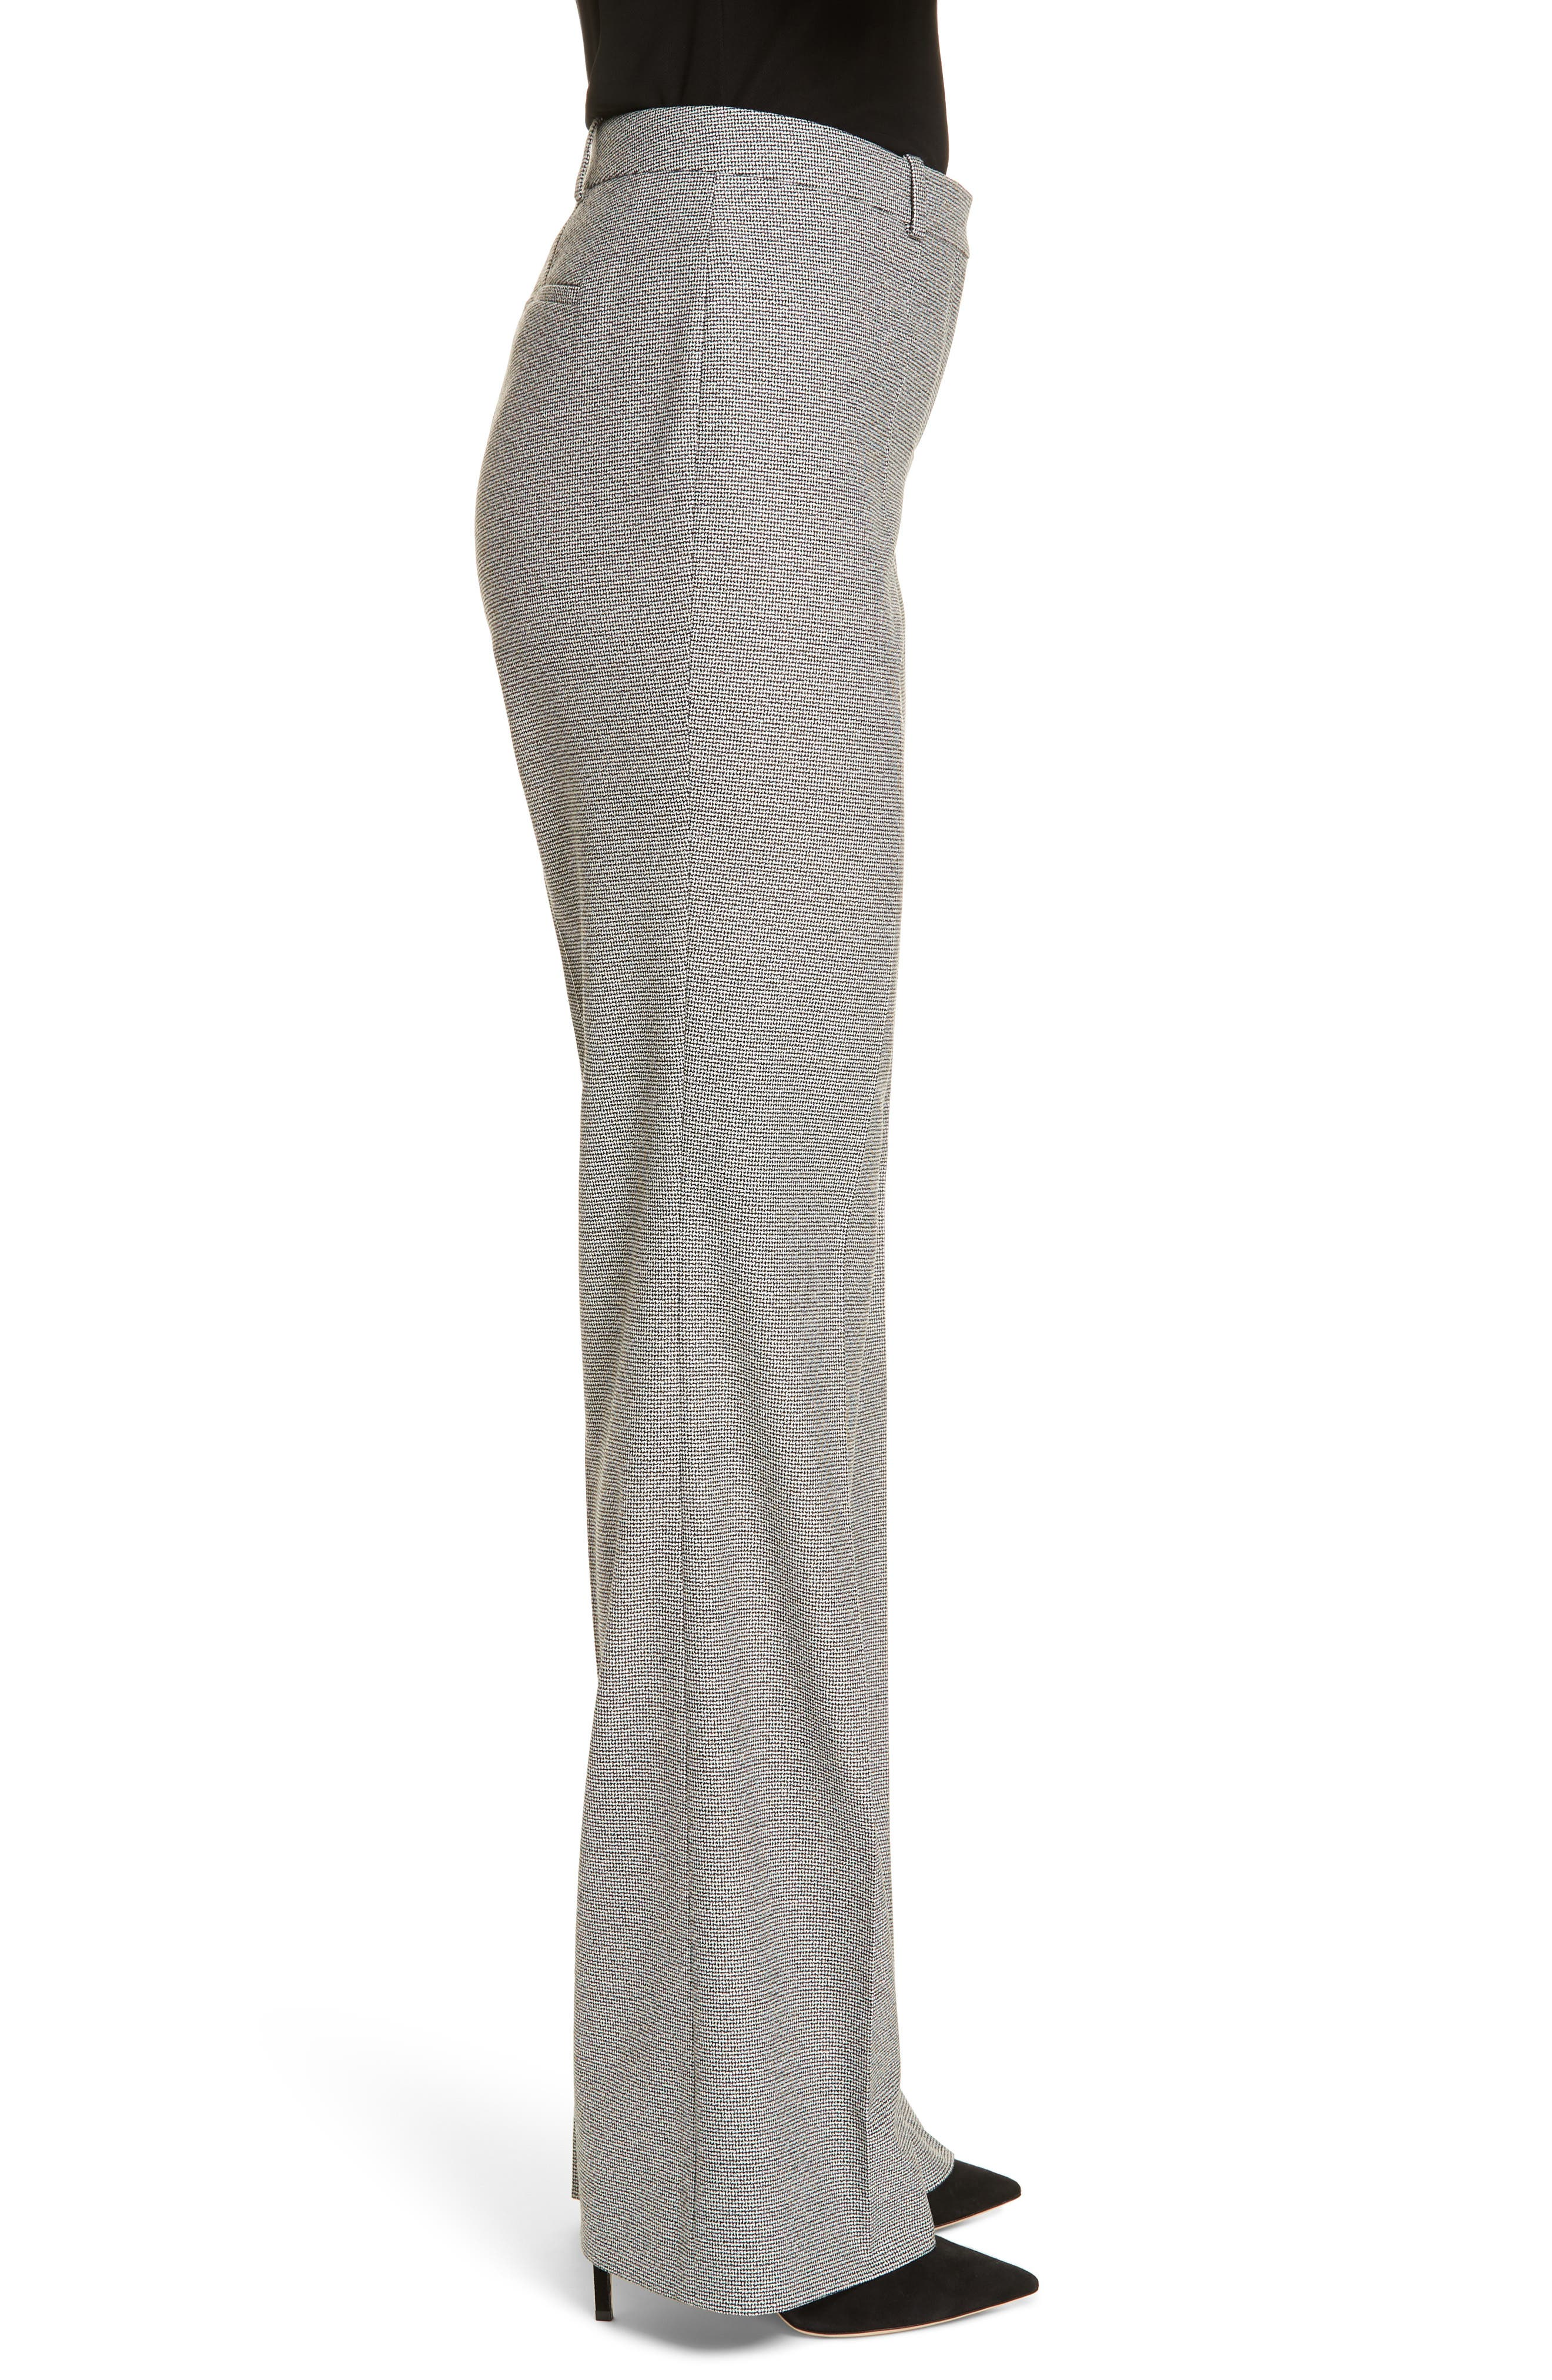 Tulea Blurred Optic Wool Suiting Trousers,                             Alternate thumbnail 3, color,                             BLACK FANTASY